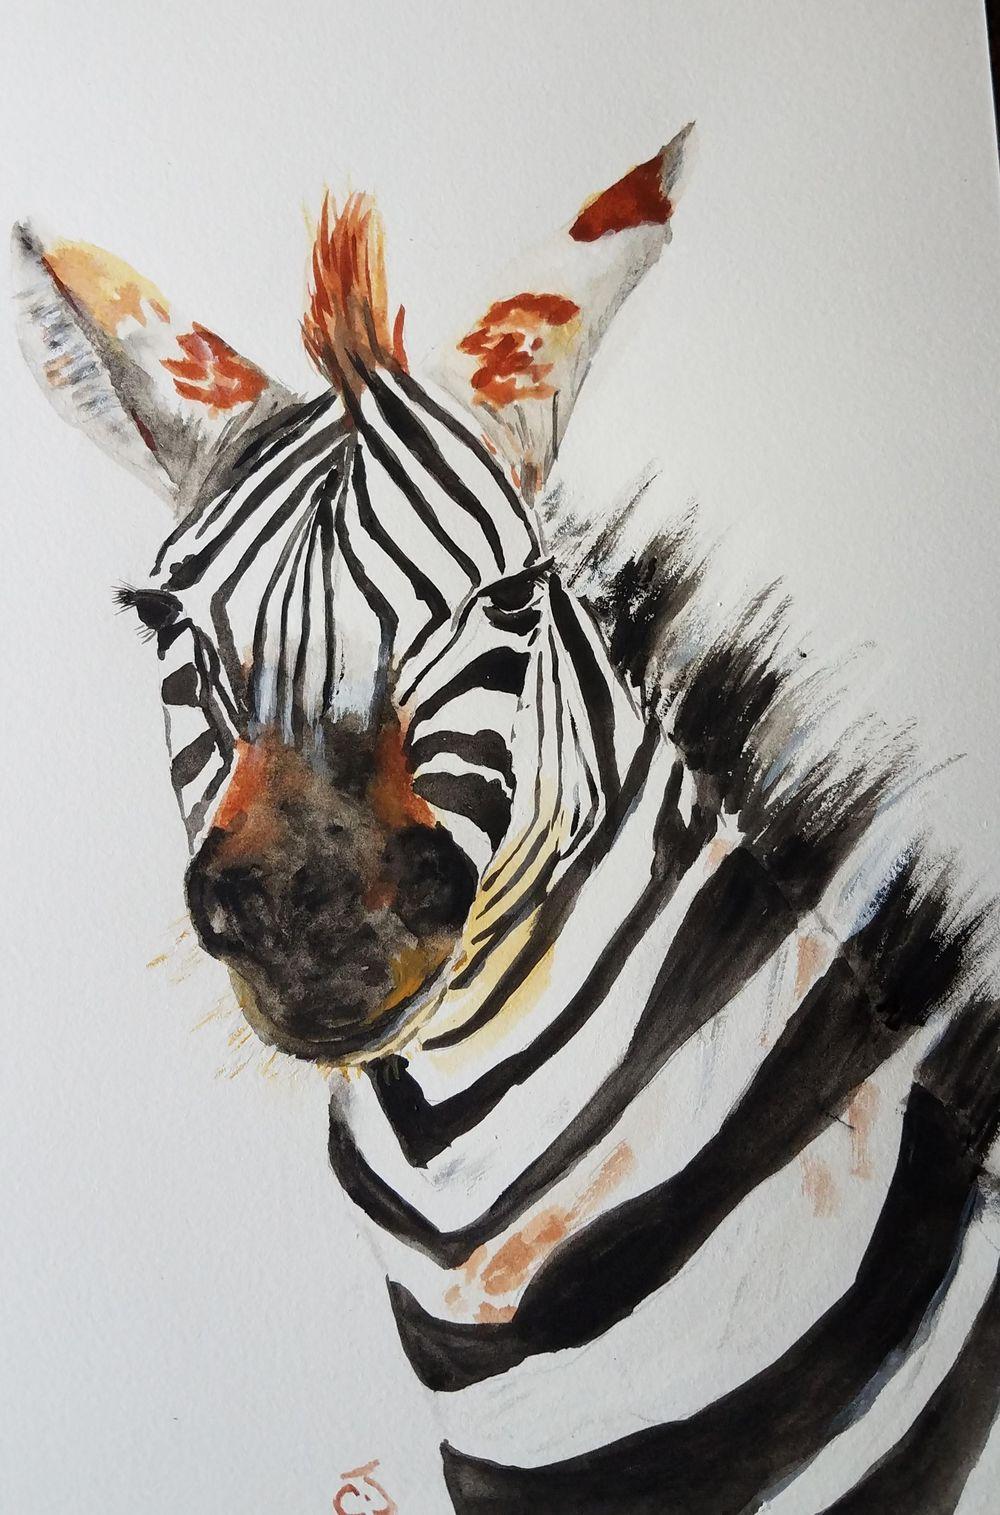 zebra - image 1 - student project